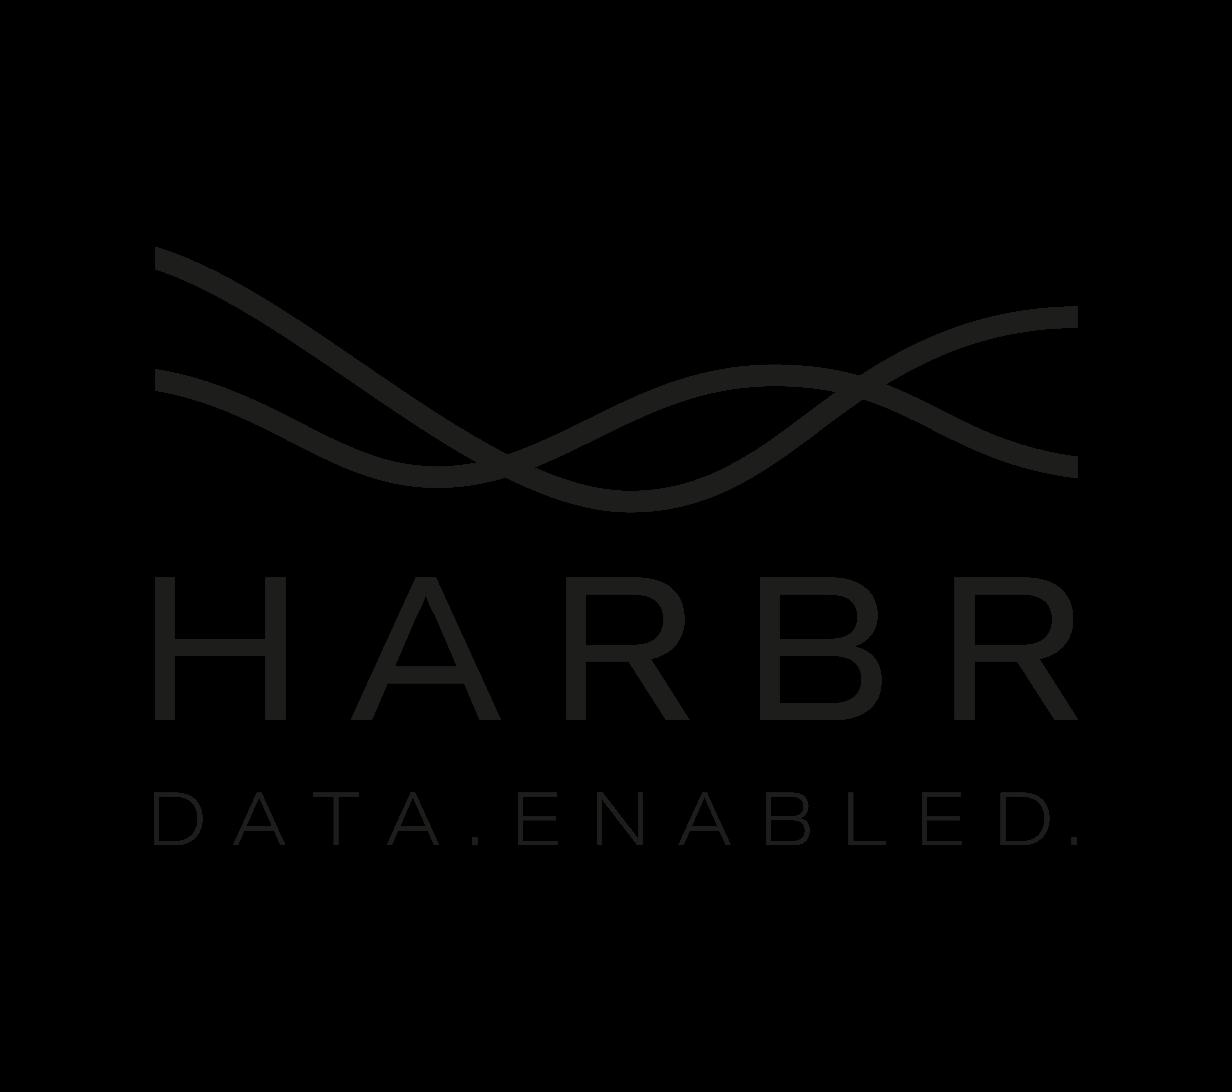 HARBR